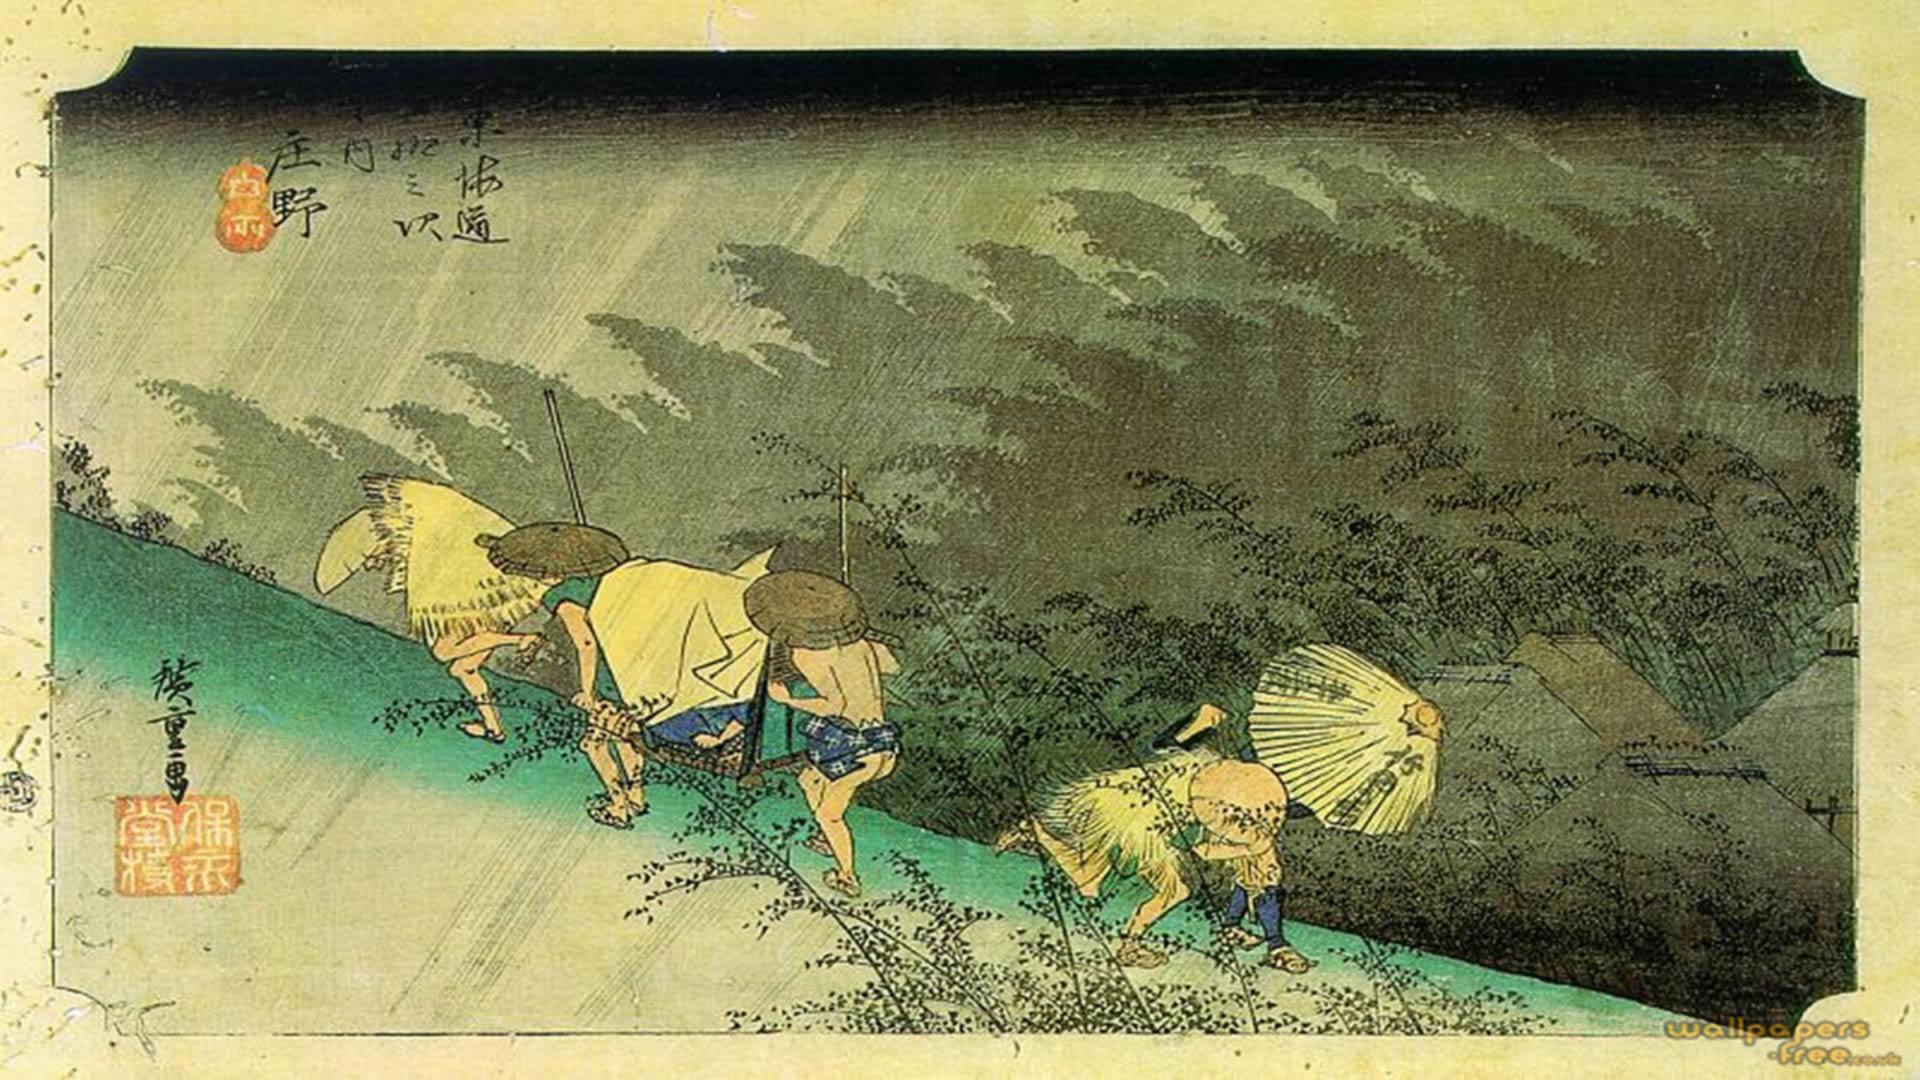 previous japanese wallpaper. Sudden Shower Over Shono